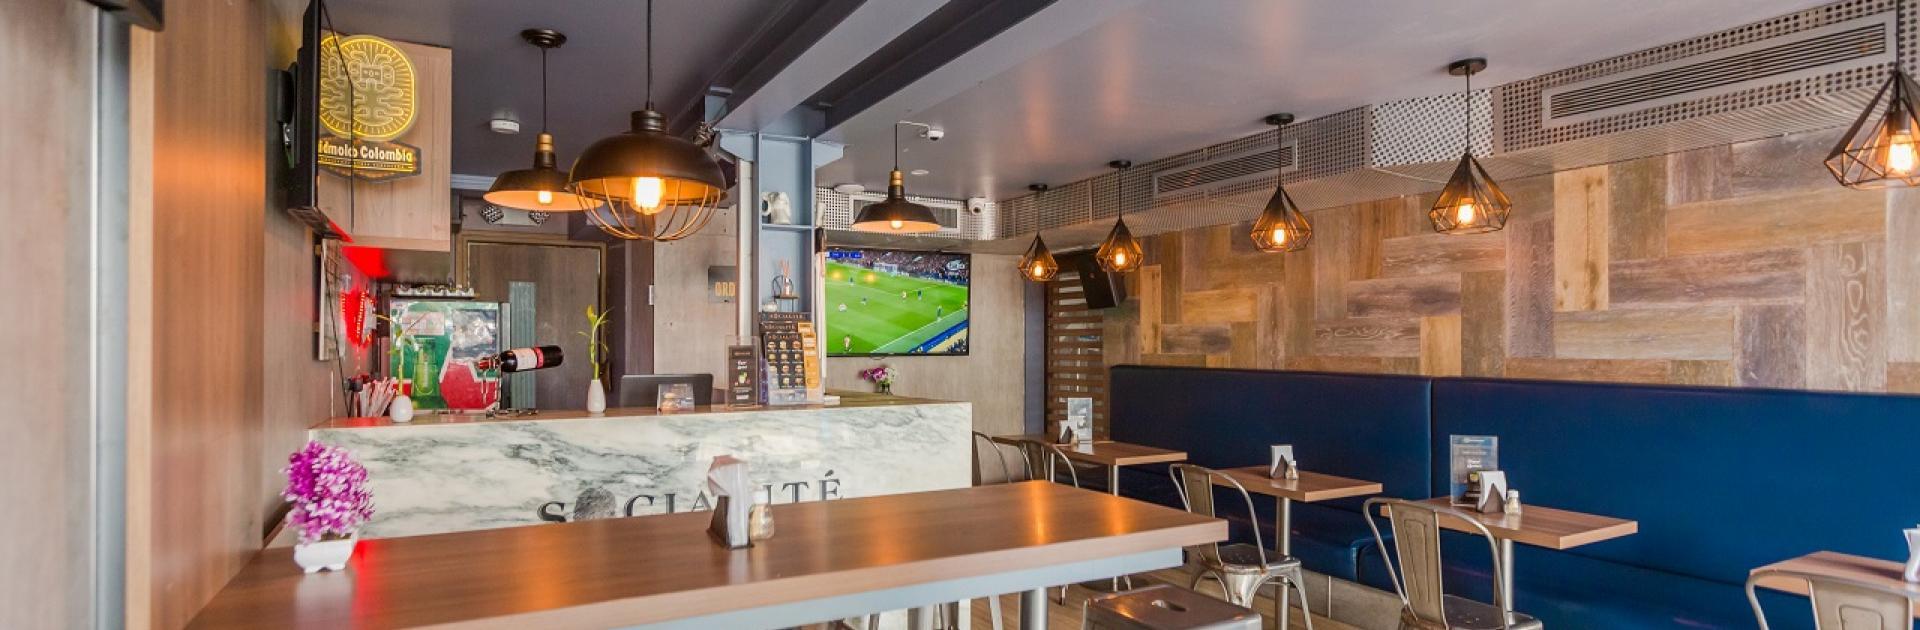 Restaurante Socialité, participante de Dónde Restaurant Week 2019 en Cartagena de Indias